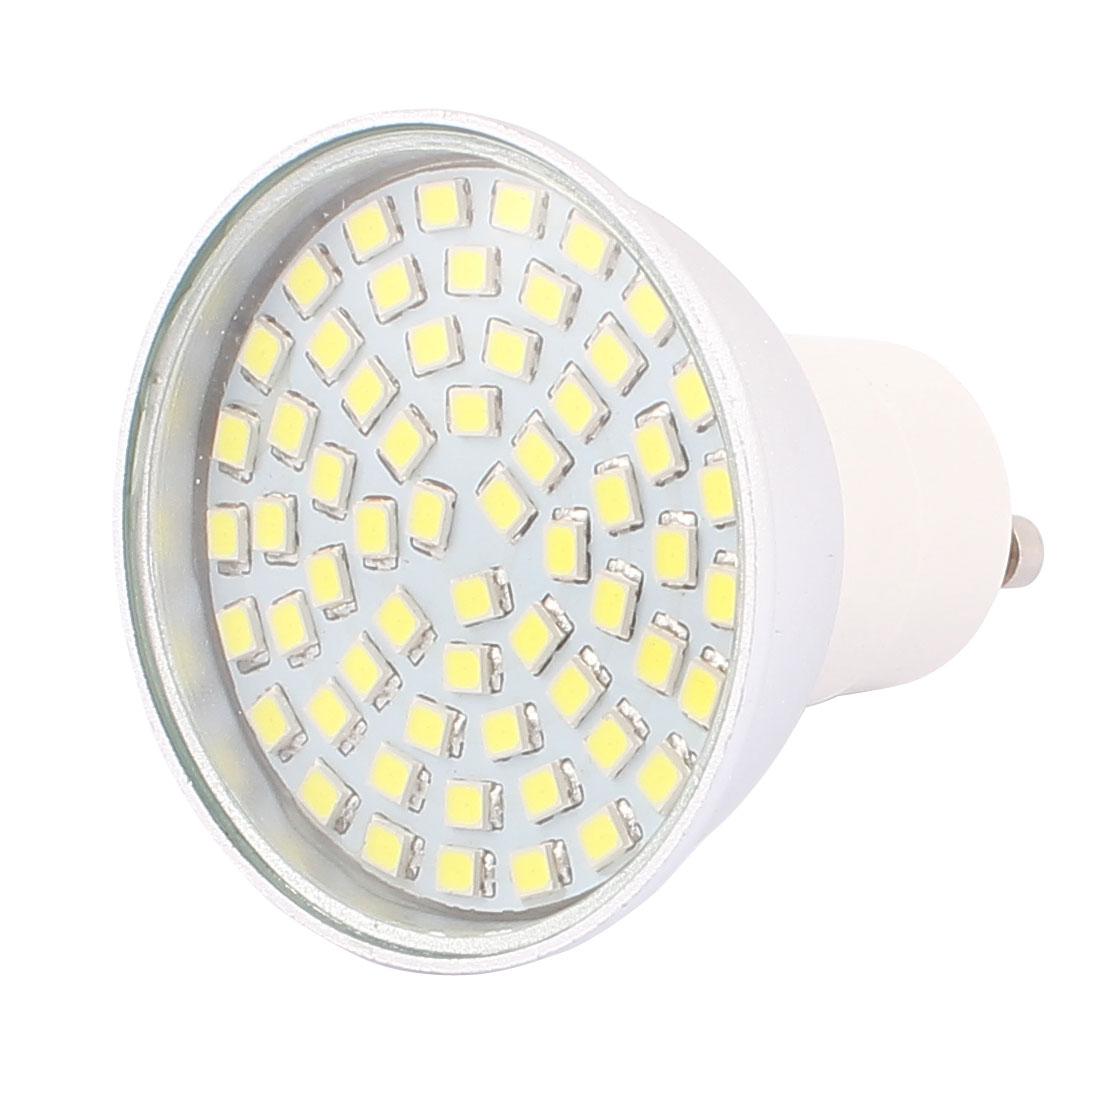 220V GU10 LED Light 6W 2835 SMD 60 LEDs Spotlight Down Lamp Energy Save Pure White